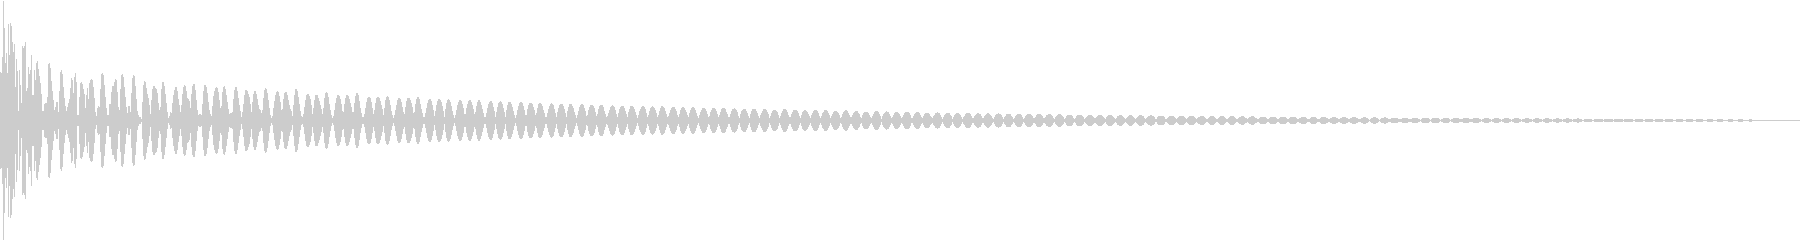 DTM Tom 16 オリジナル音源の未再生の波形